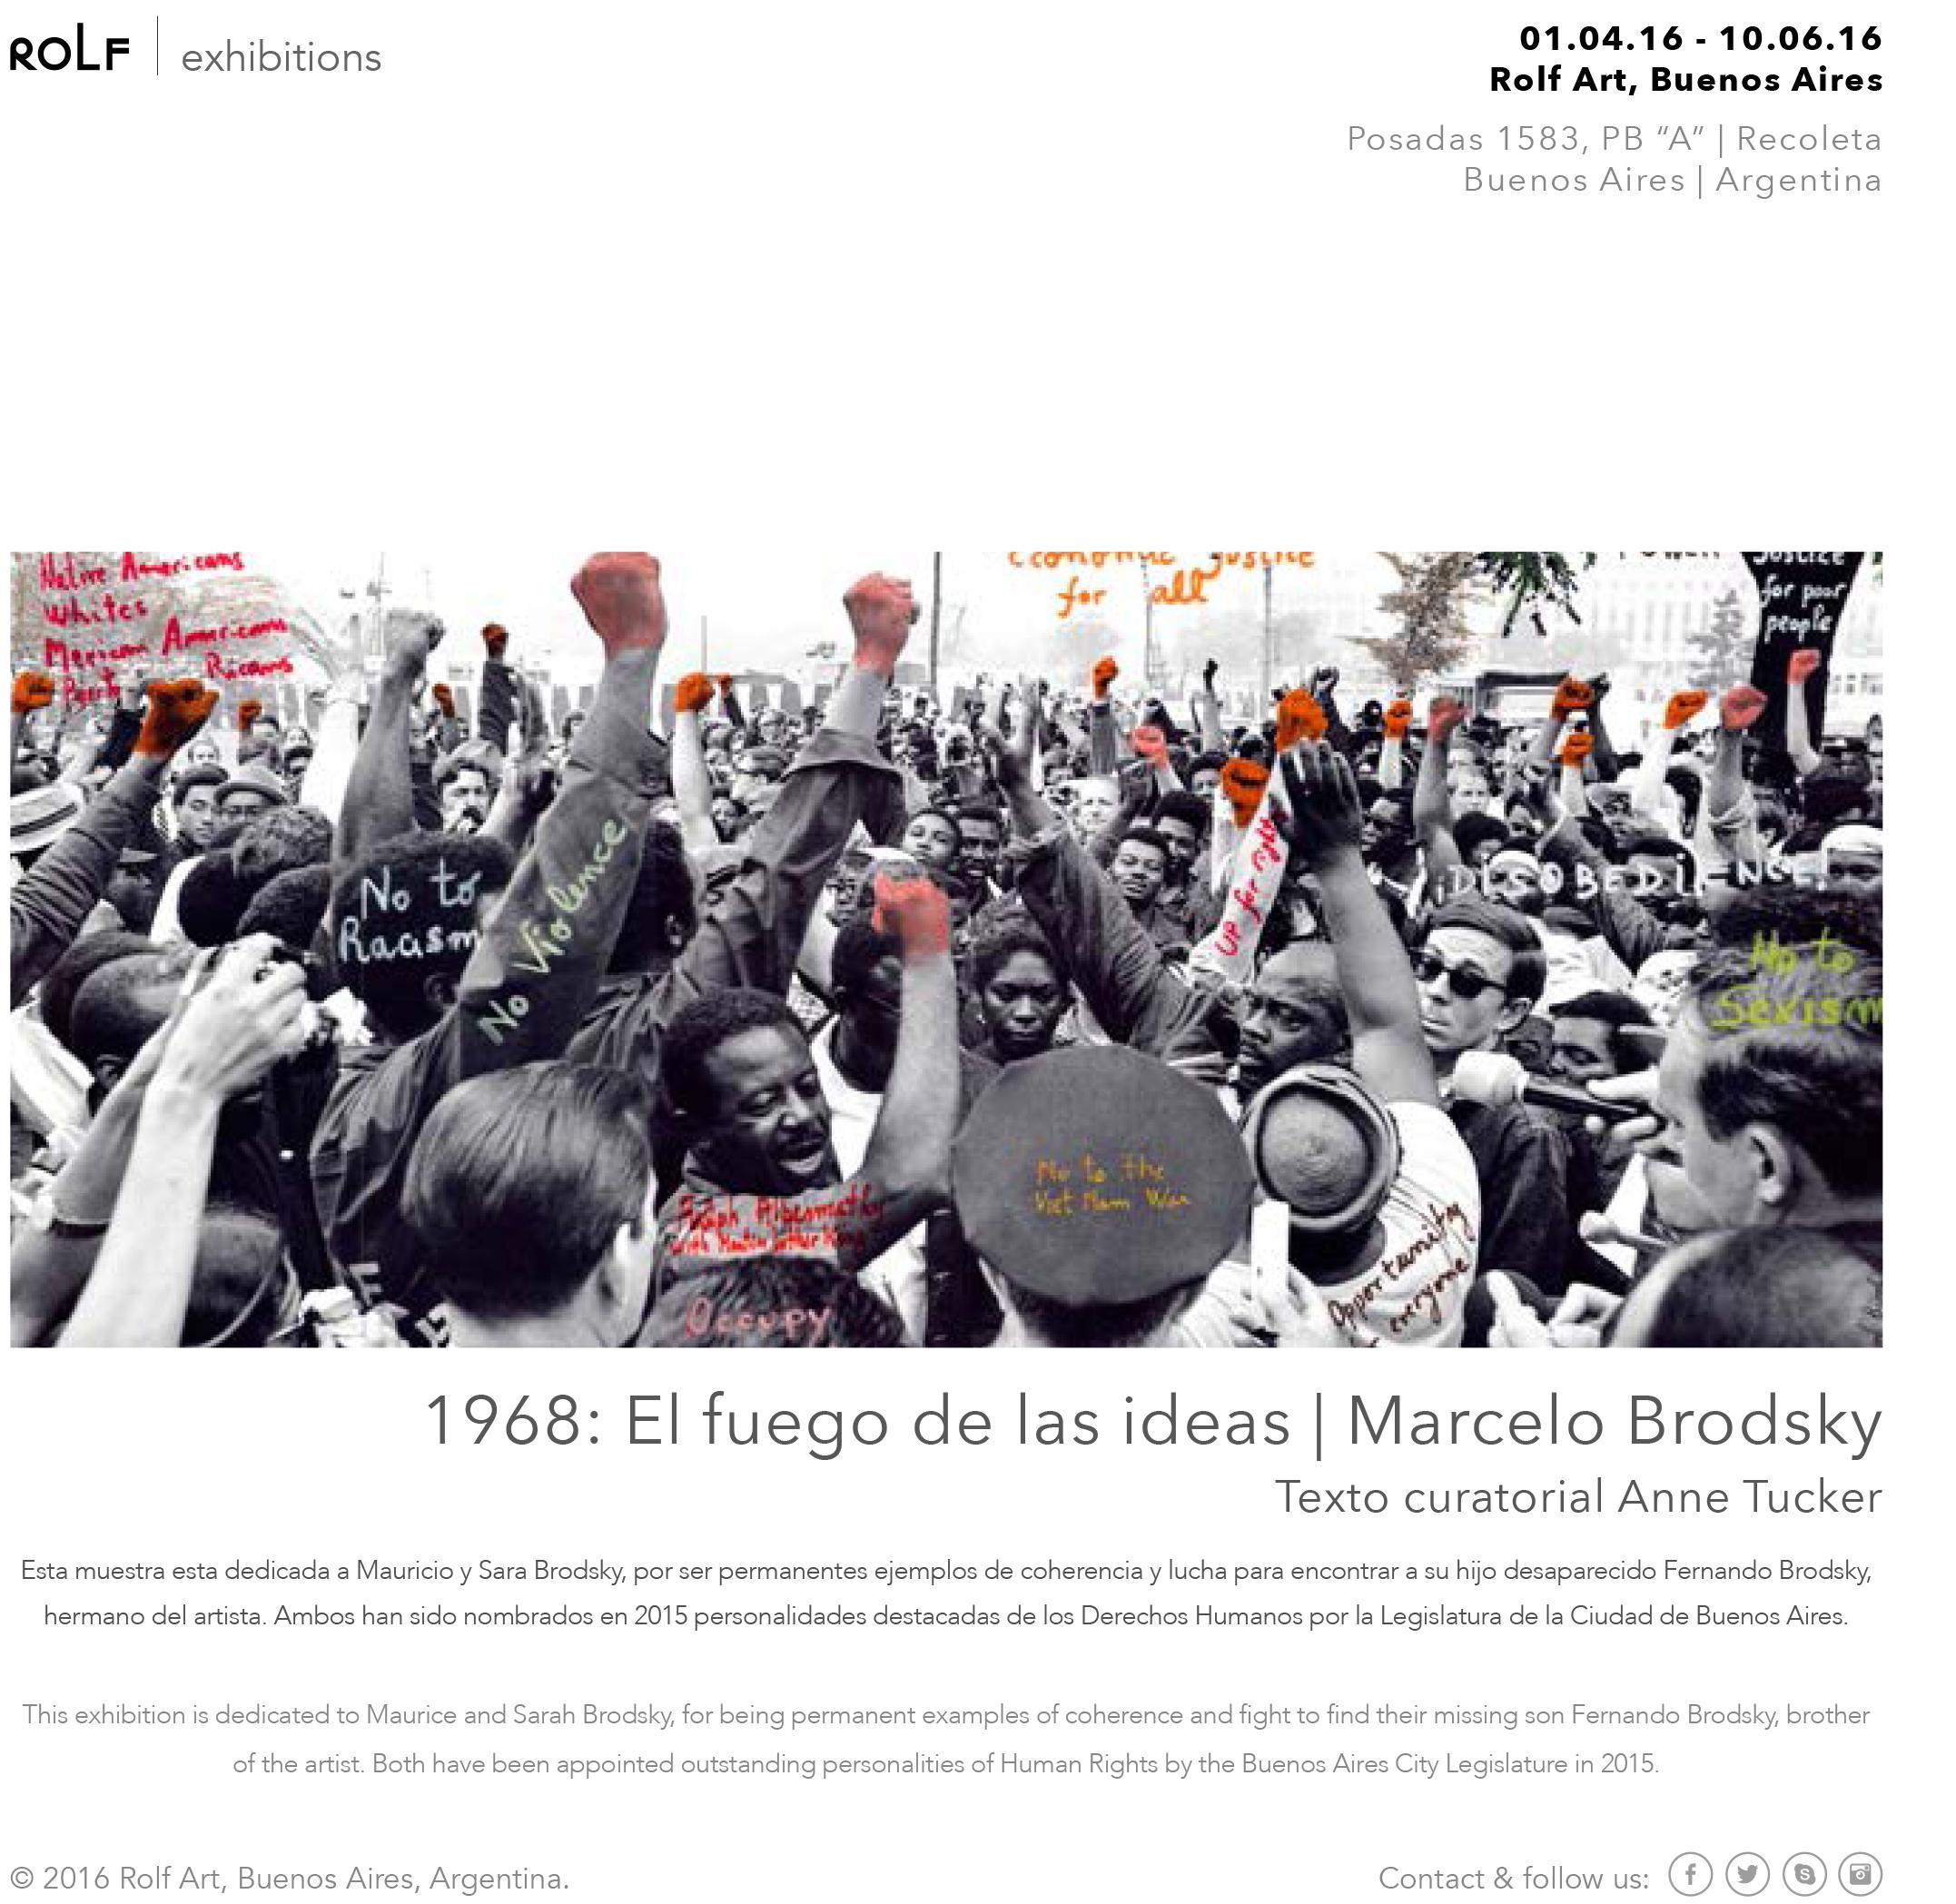 Rolf-Art-_-Marcelo-Brodsky-_-1968s-_-Bro